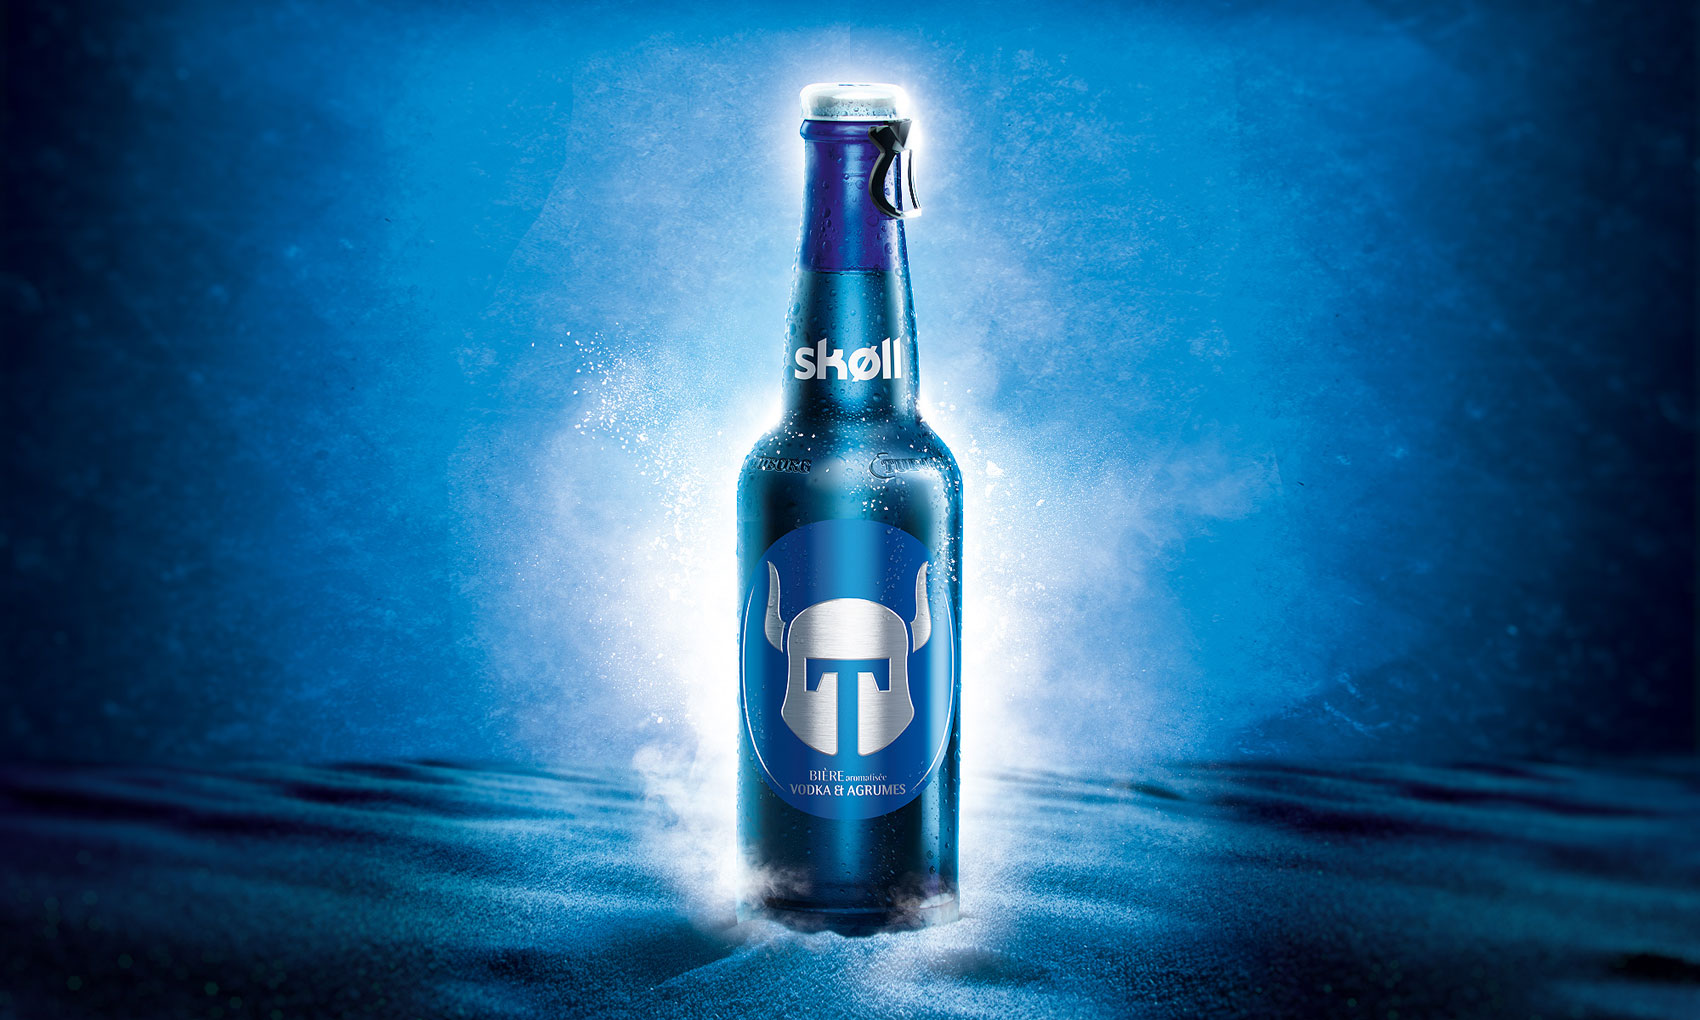 bouteille-skoll-3